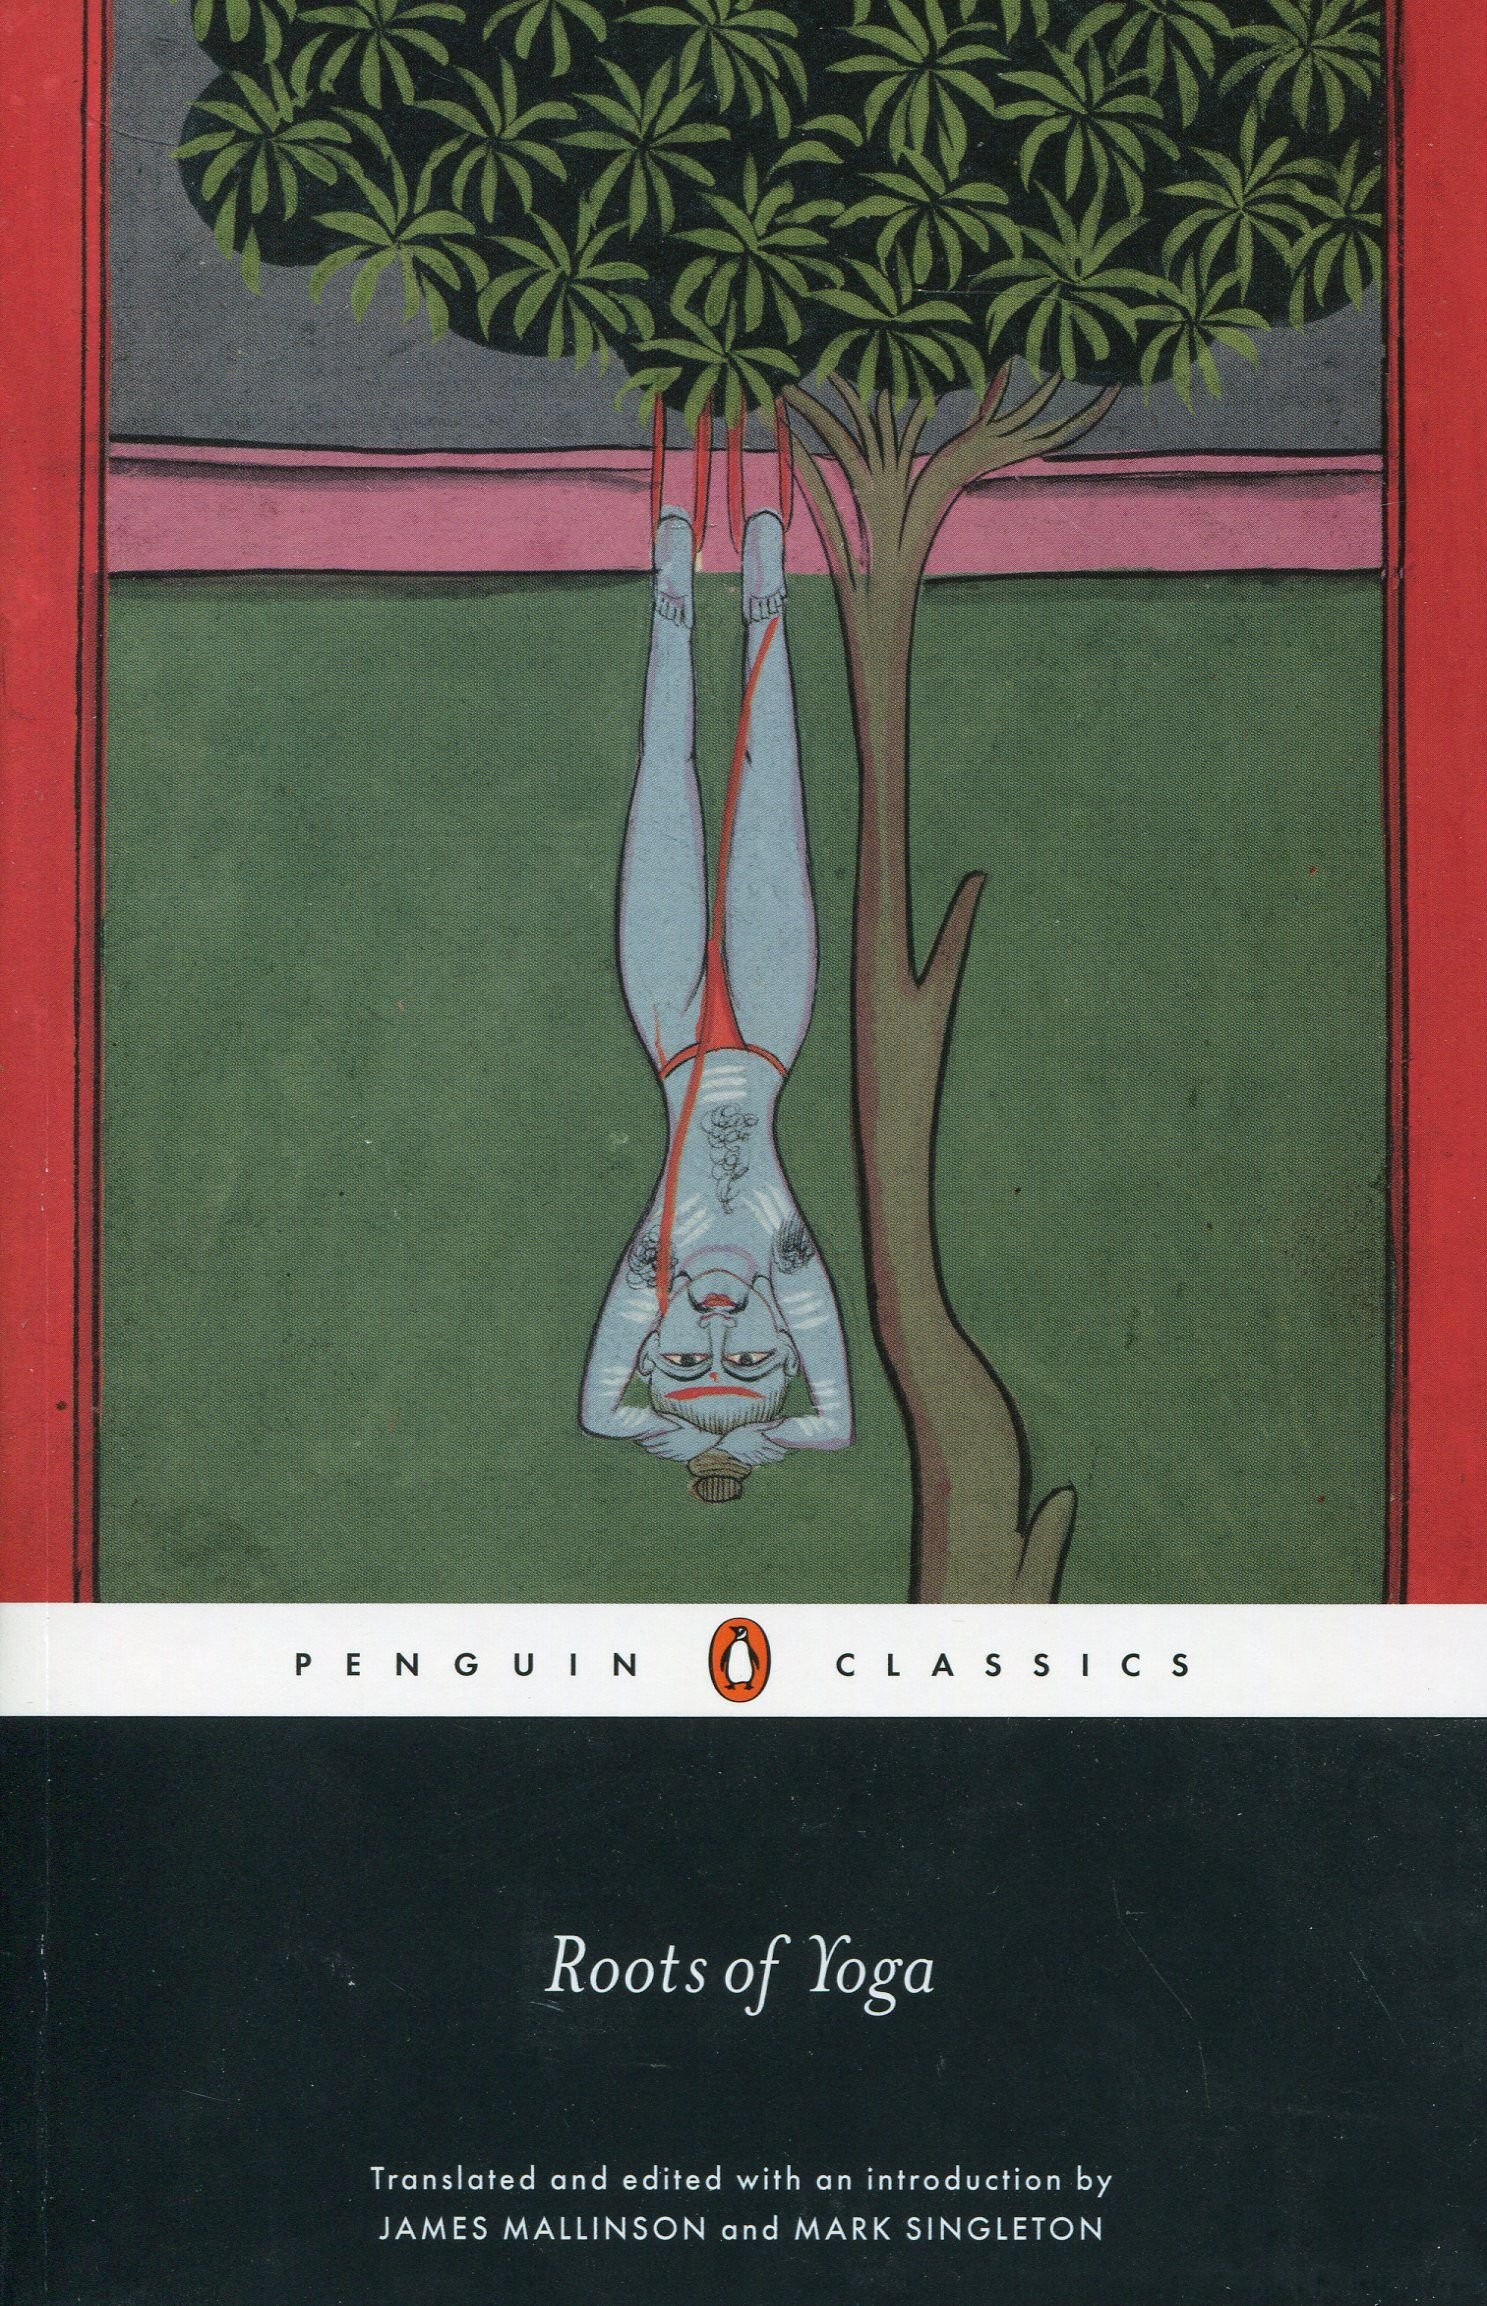 Roots Penguin Classics James Mallinson product image